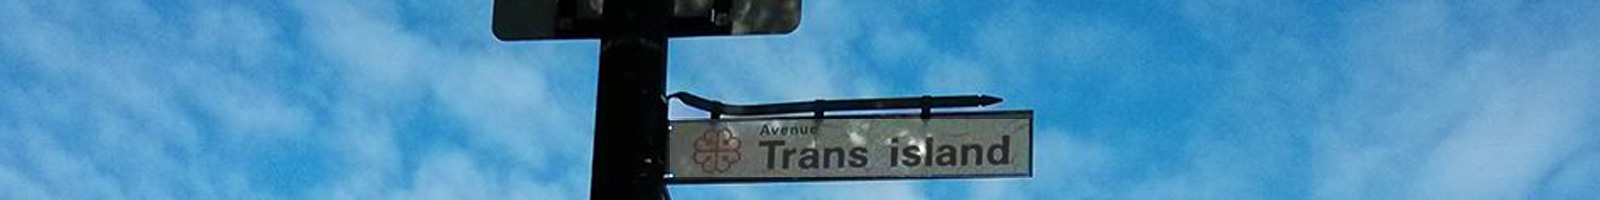 Trans Island